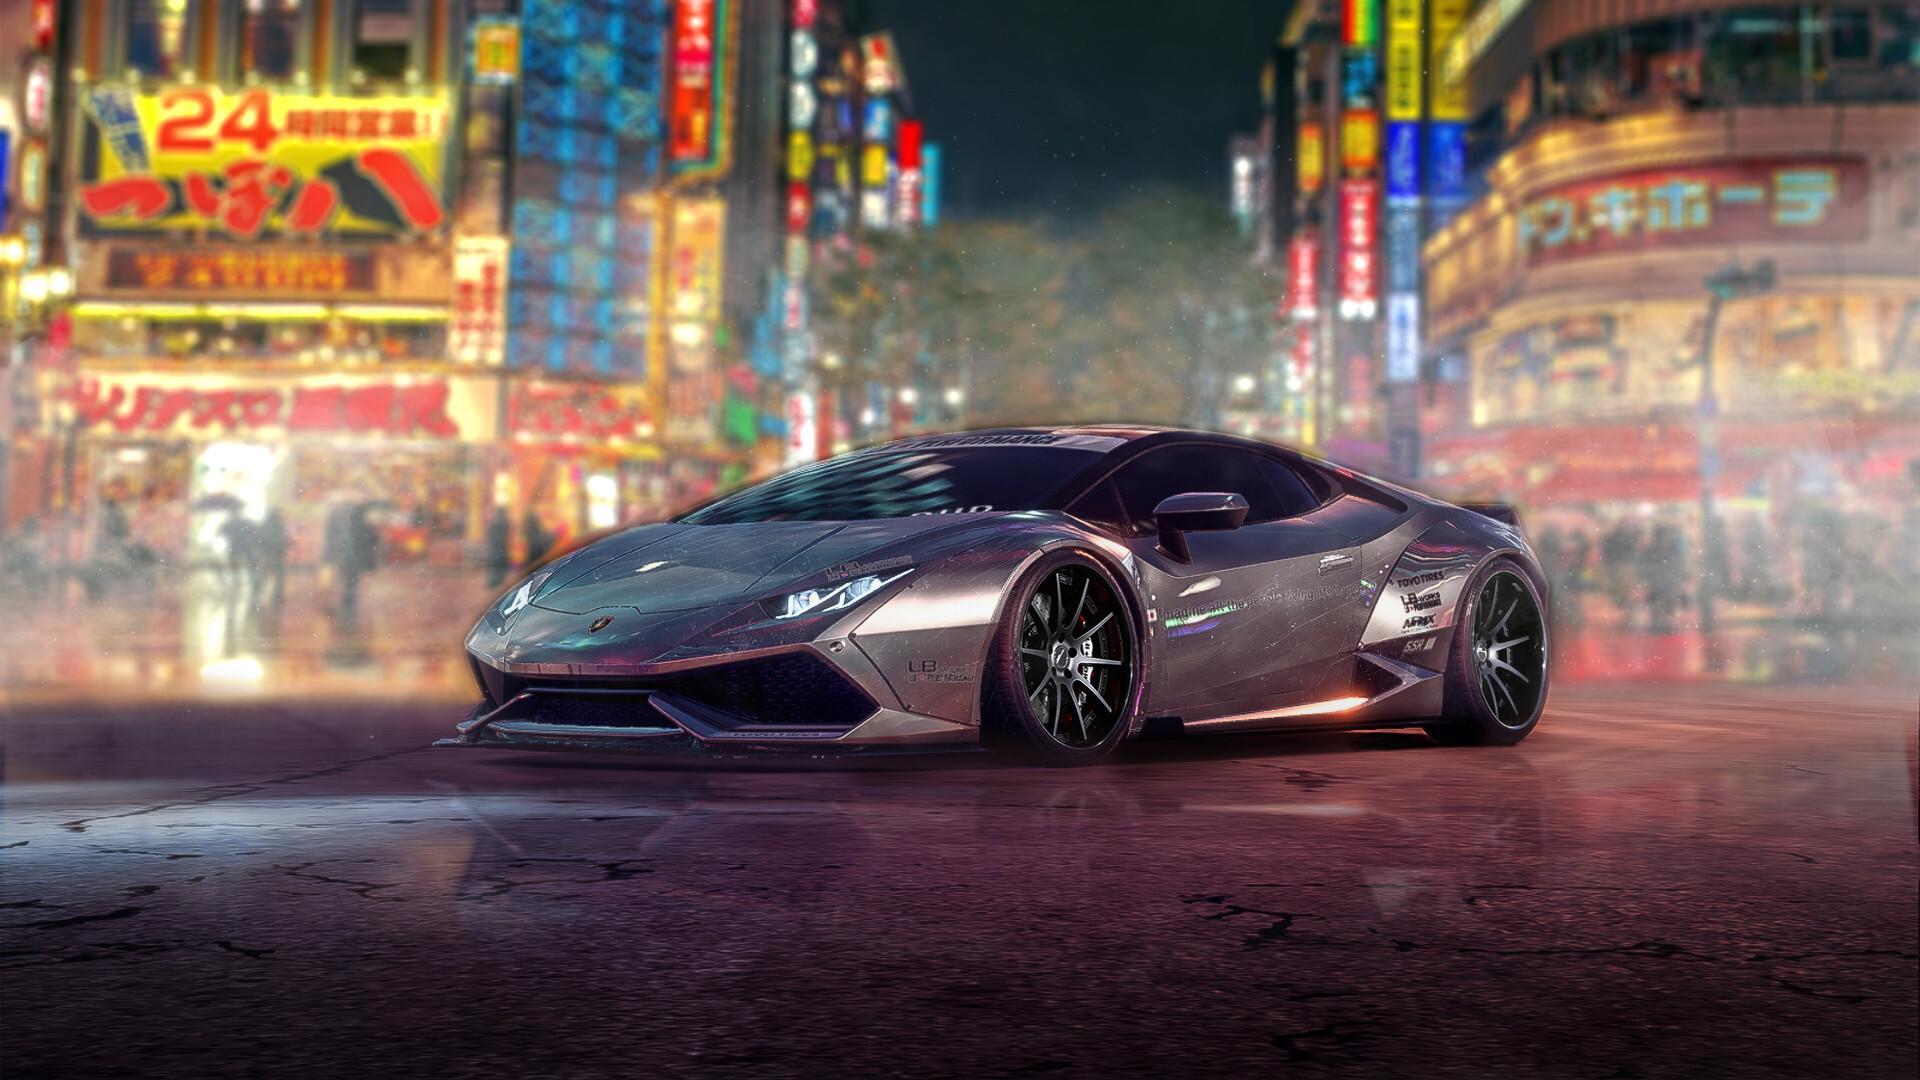 Nfs Payback Lamborghini Gt